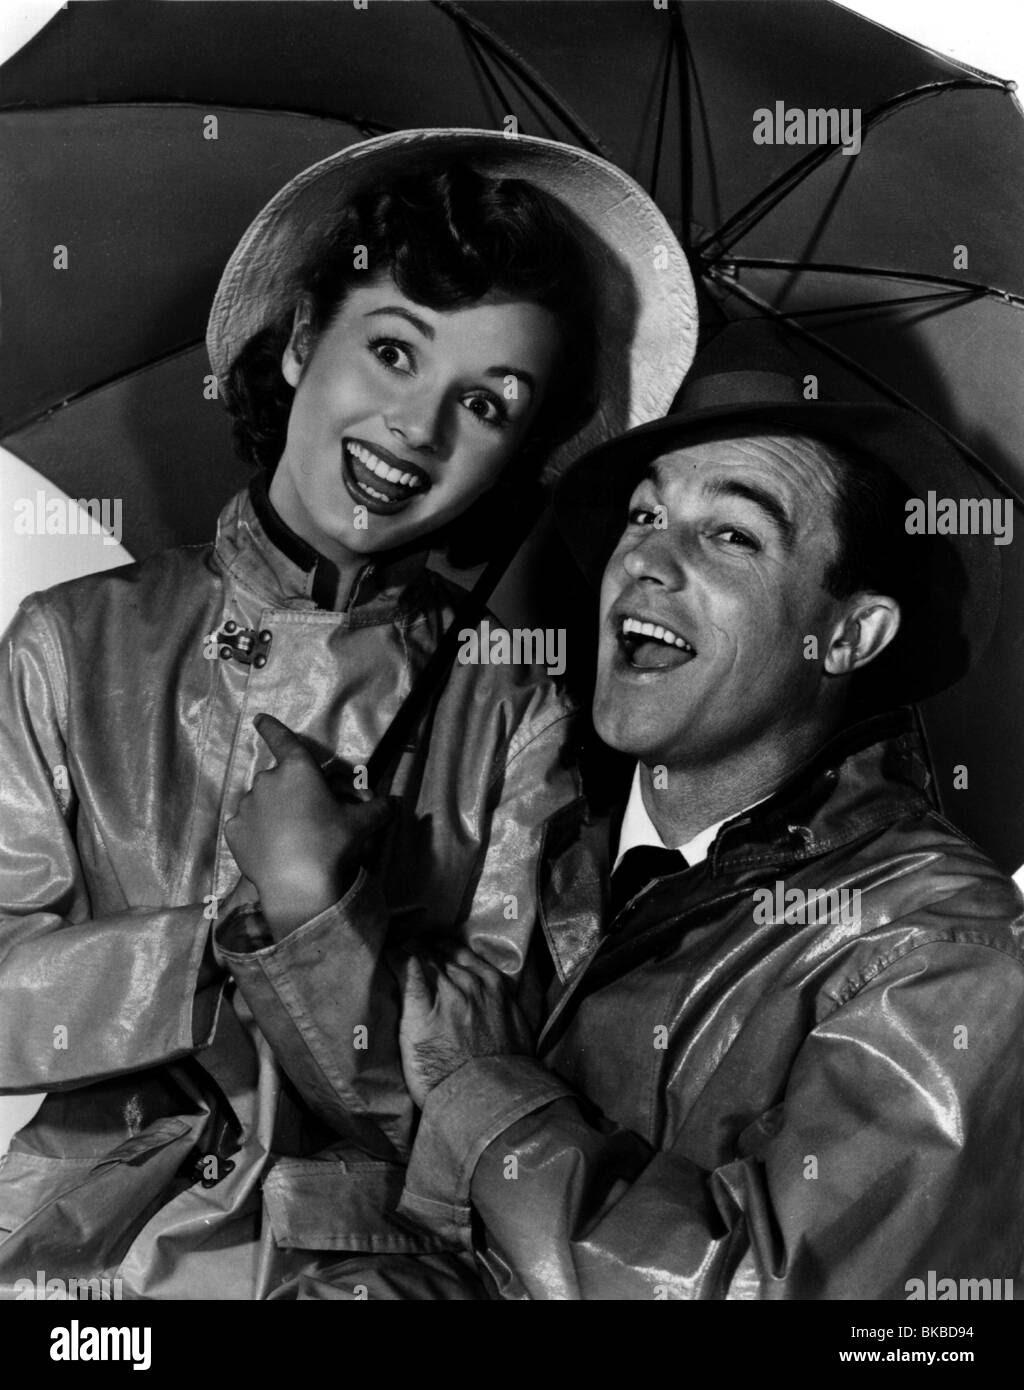 SINGIN IN THE RAIN 1952 SINGING IN THE RAIN ALT DEBBIE